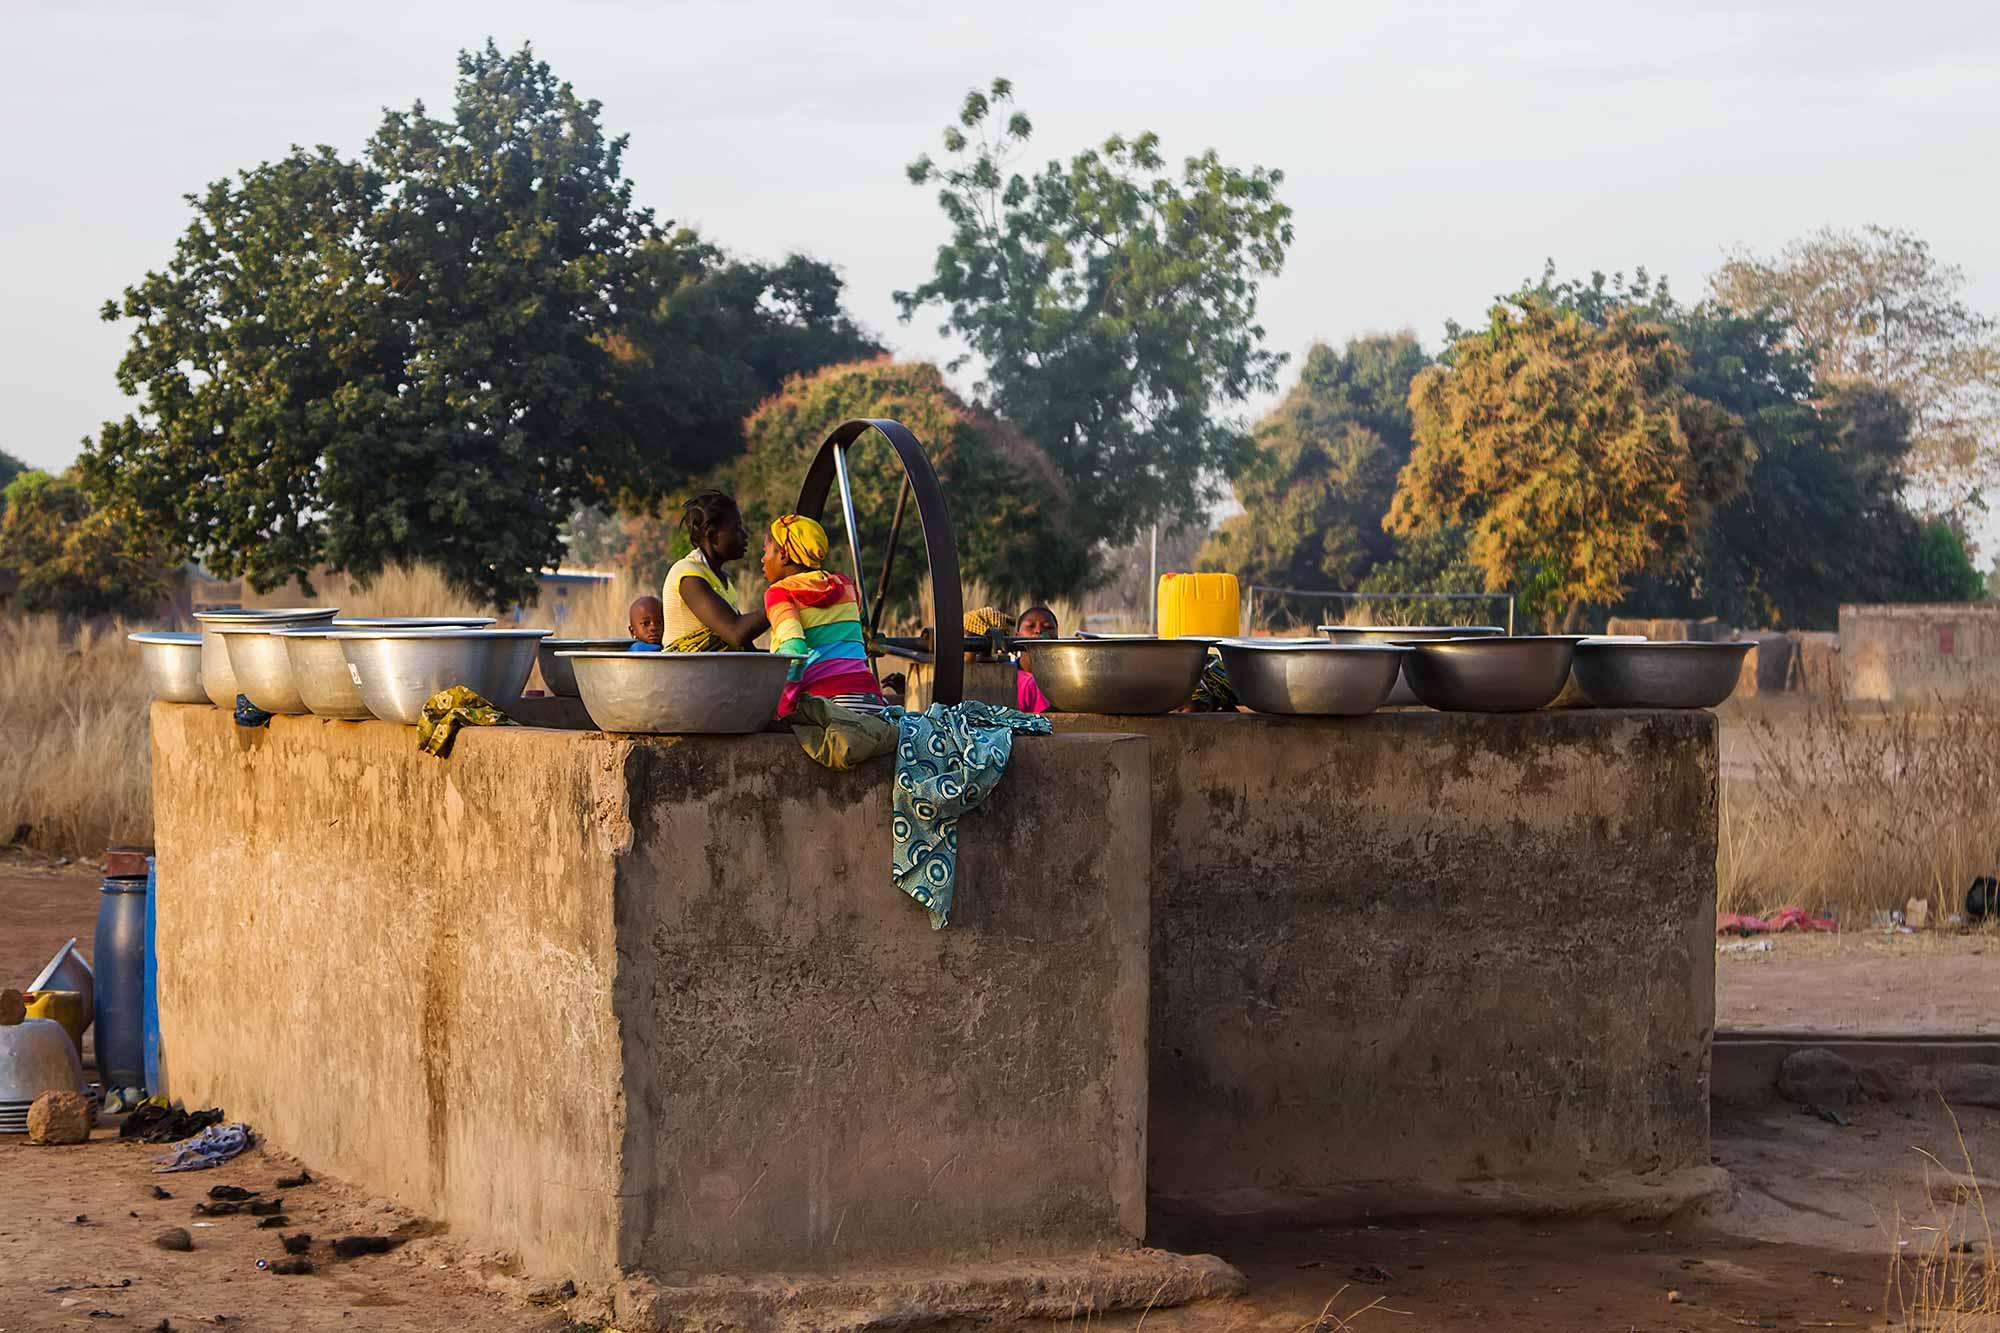 banfora-family-washing-cloths-burkina-faso-africa